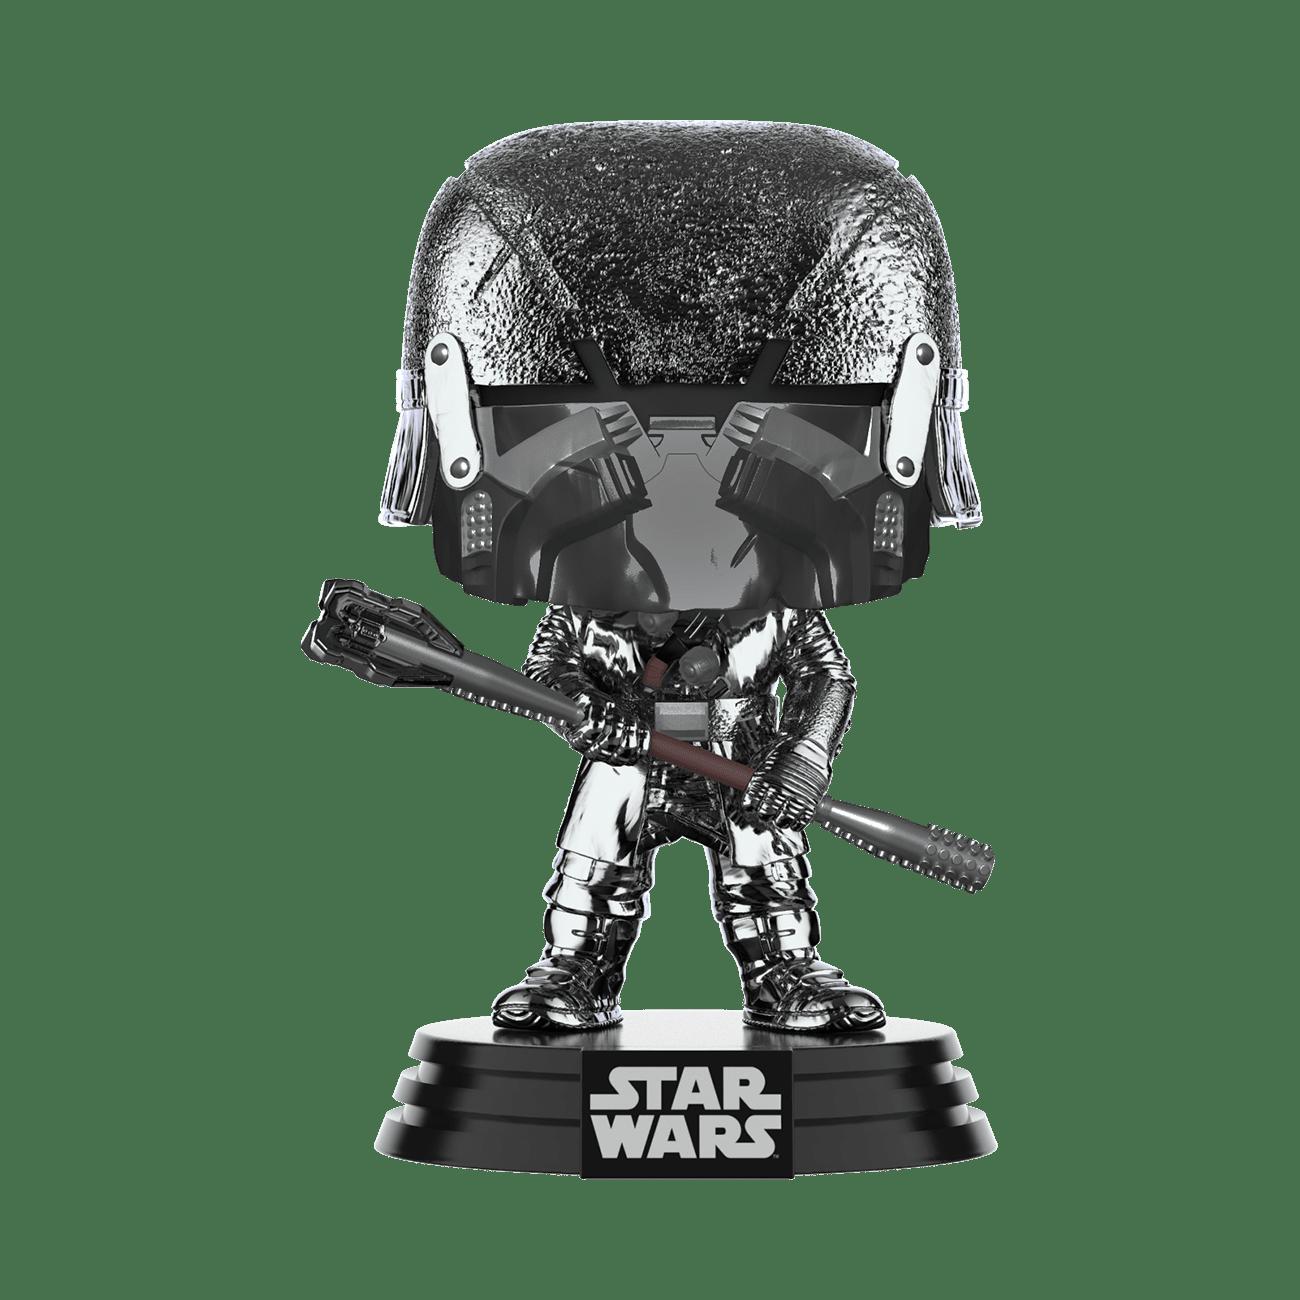 Star Wars: The Rise of Skywalker Hematite Chrome Knight of Ren Club Pop! Vinyl Figure